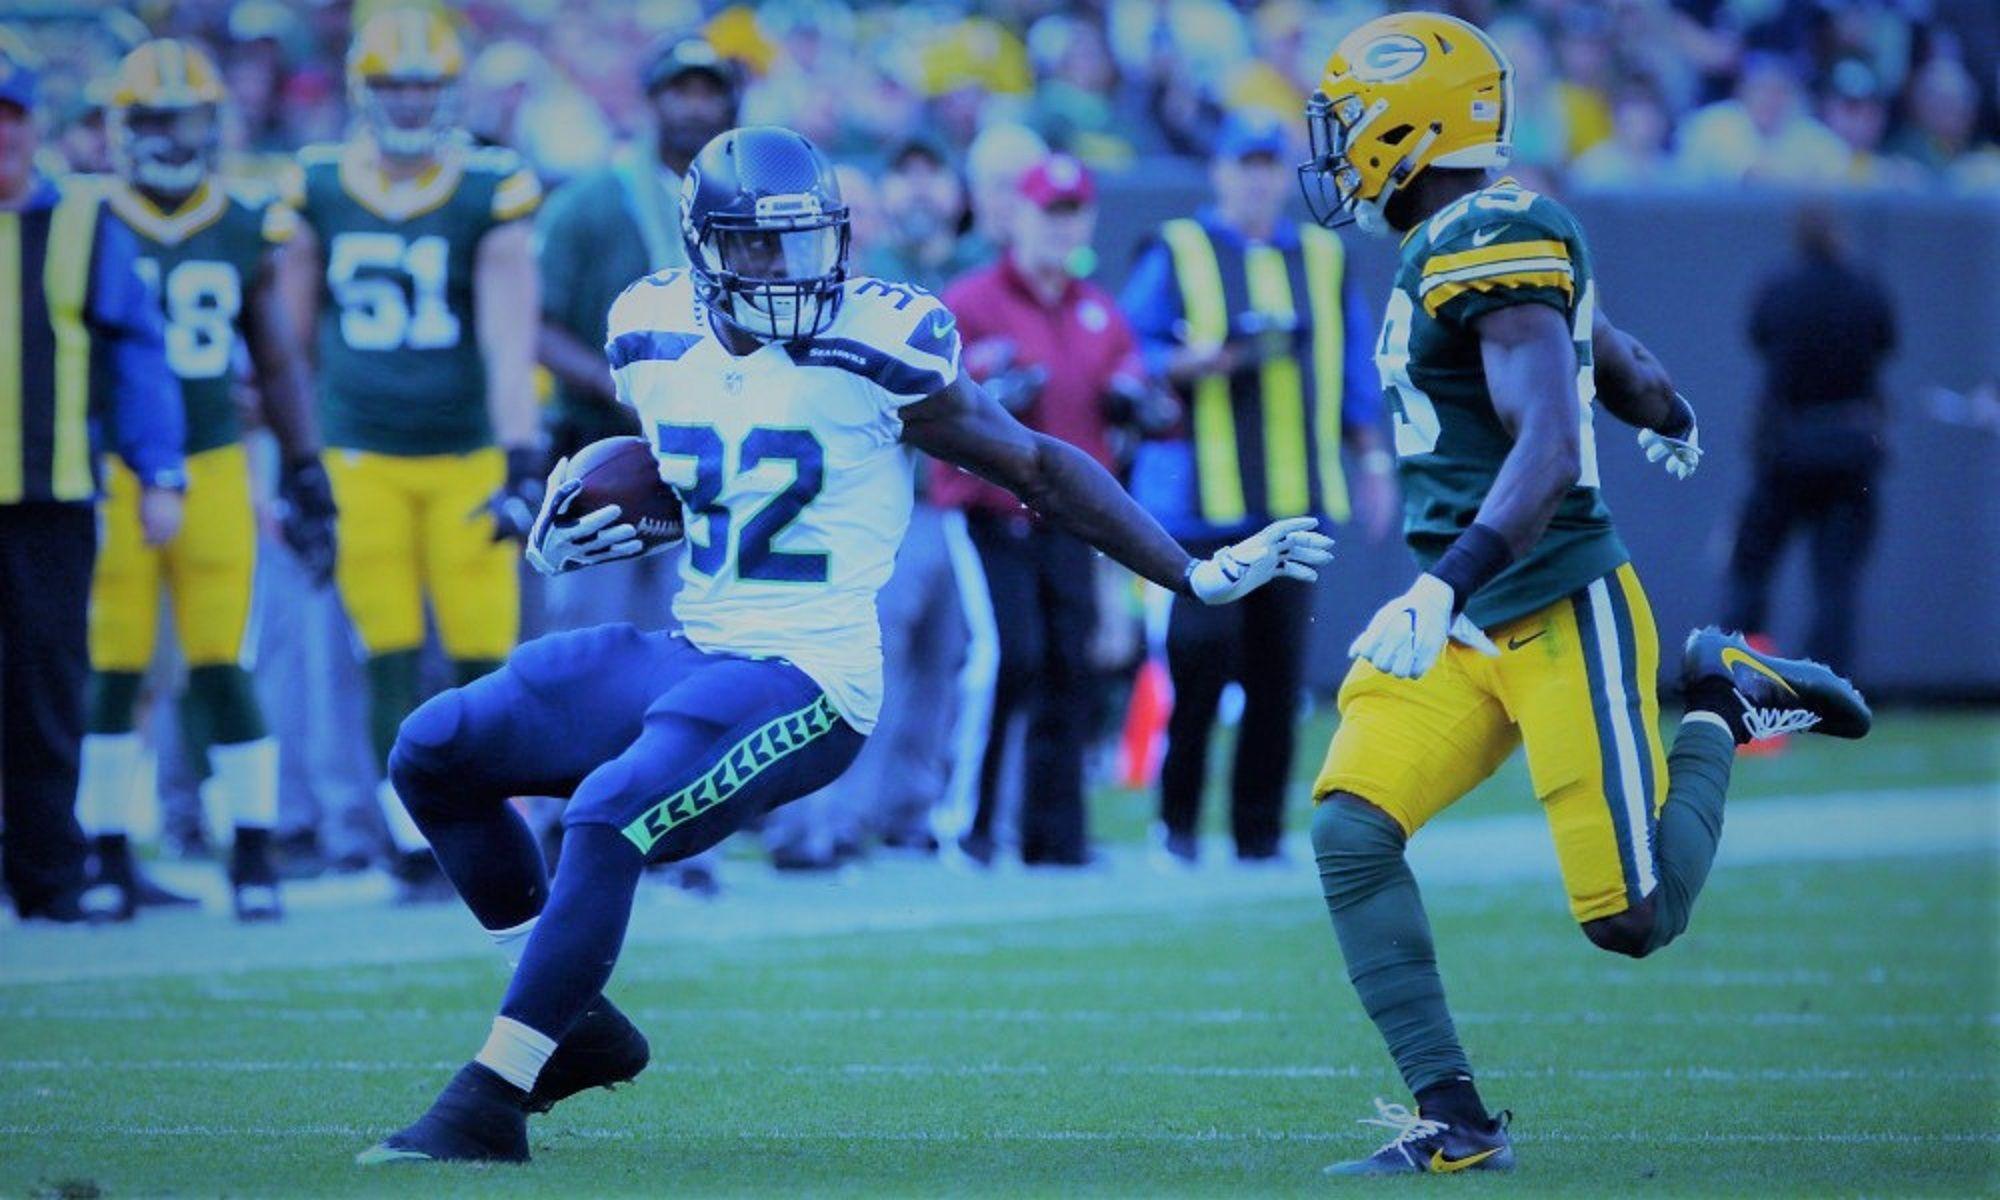 Green Bay Packers vs. Seattle Seahawks Live Stream Free